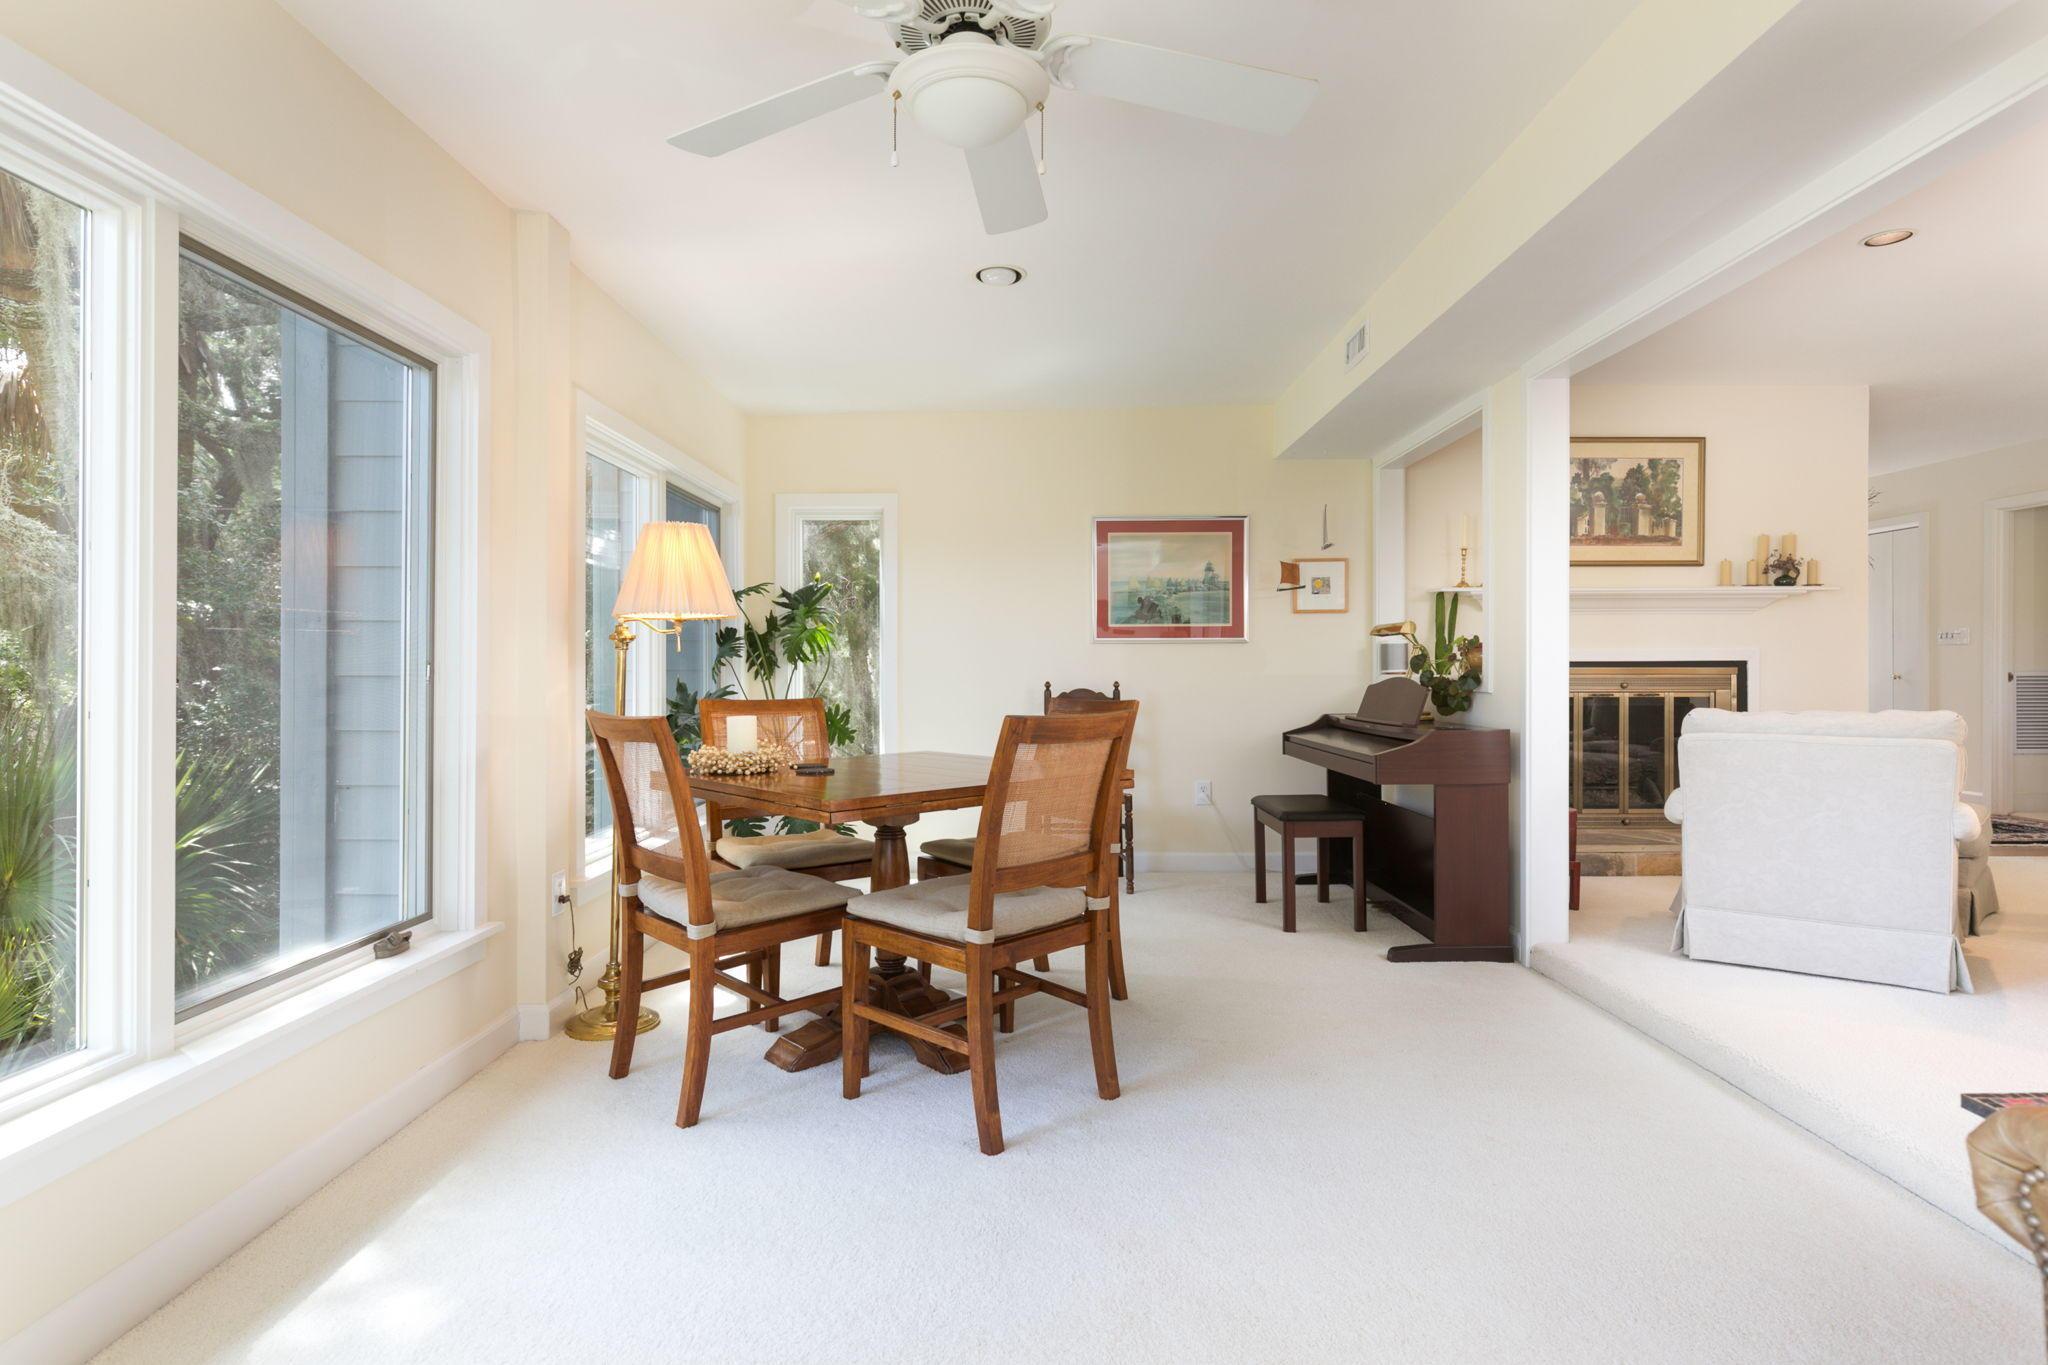 Seabrook Island Homes For Sale - 3360 Seabrook Island, Seabrook Island, SC - 14